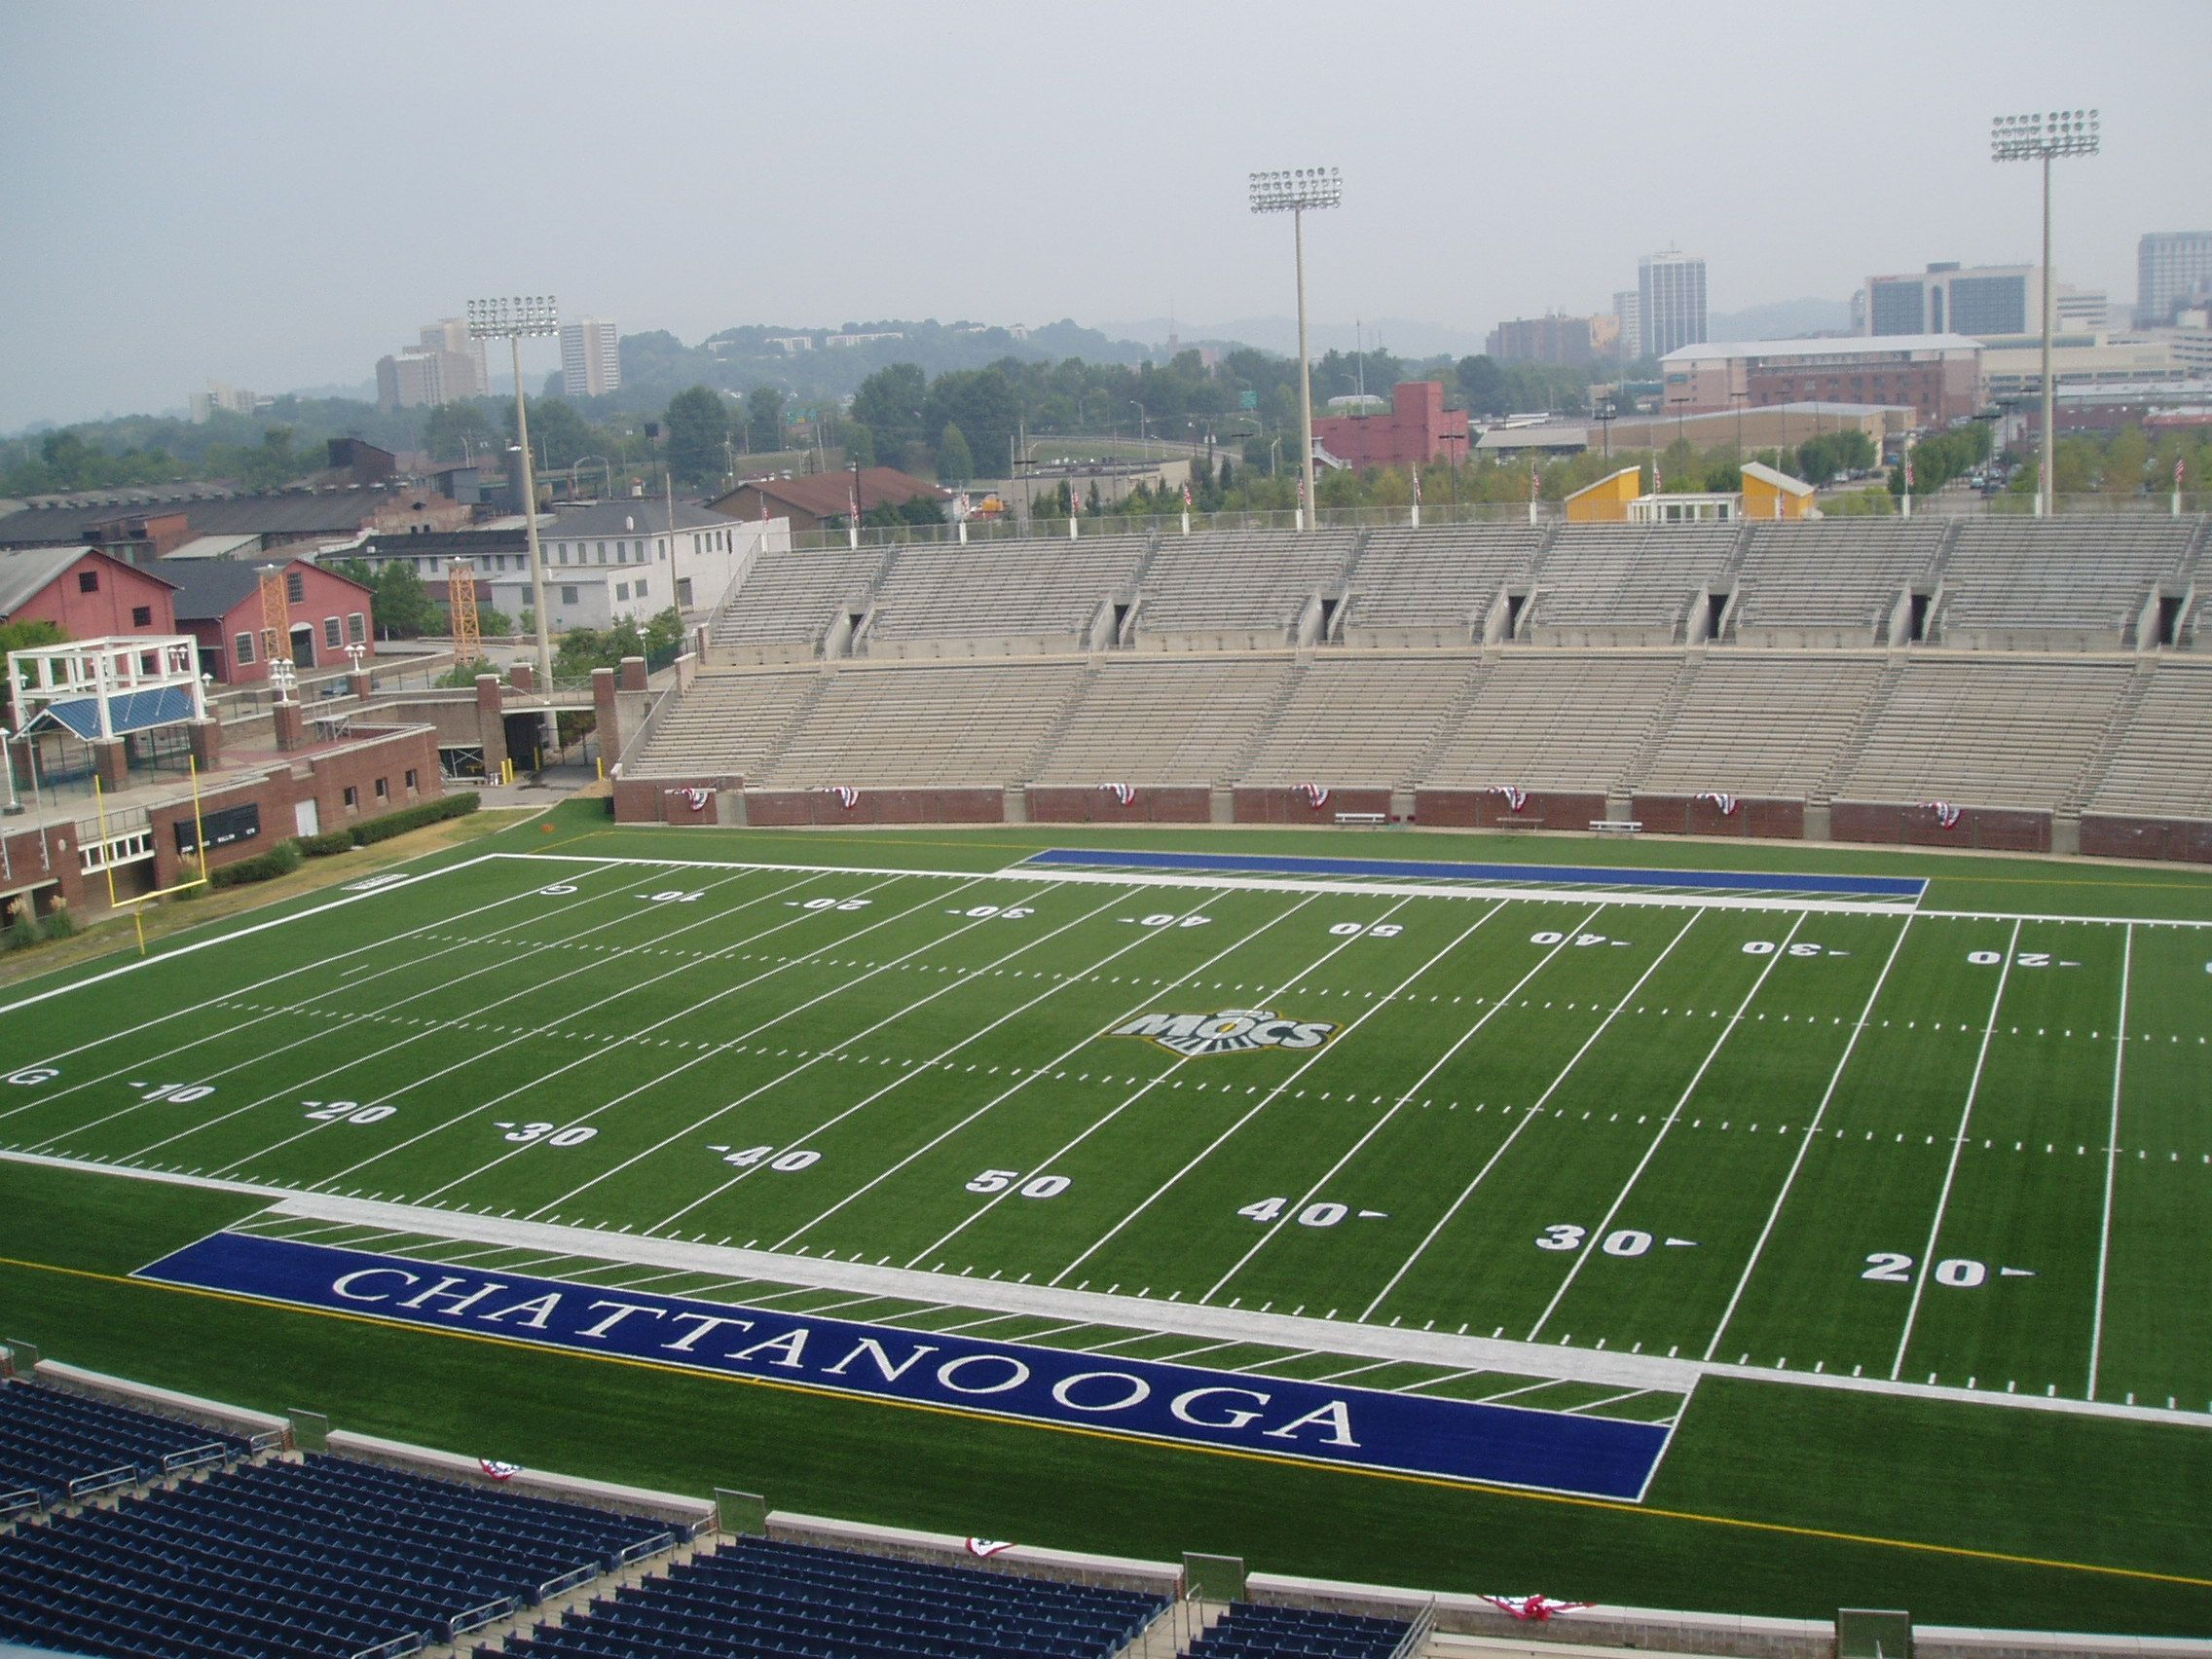 Utc Finley Stadium Chattanooga Tennessee Chattanooga University Of Tennessee